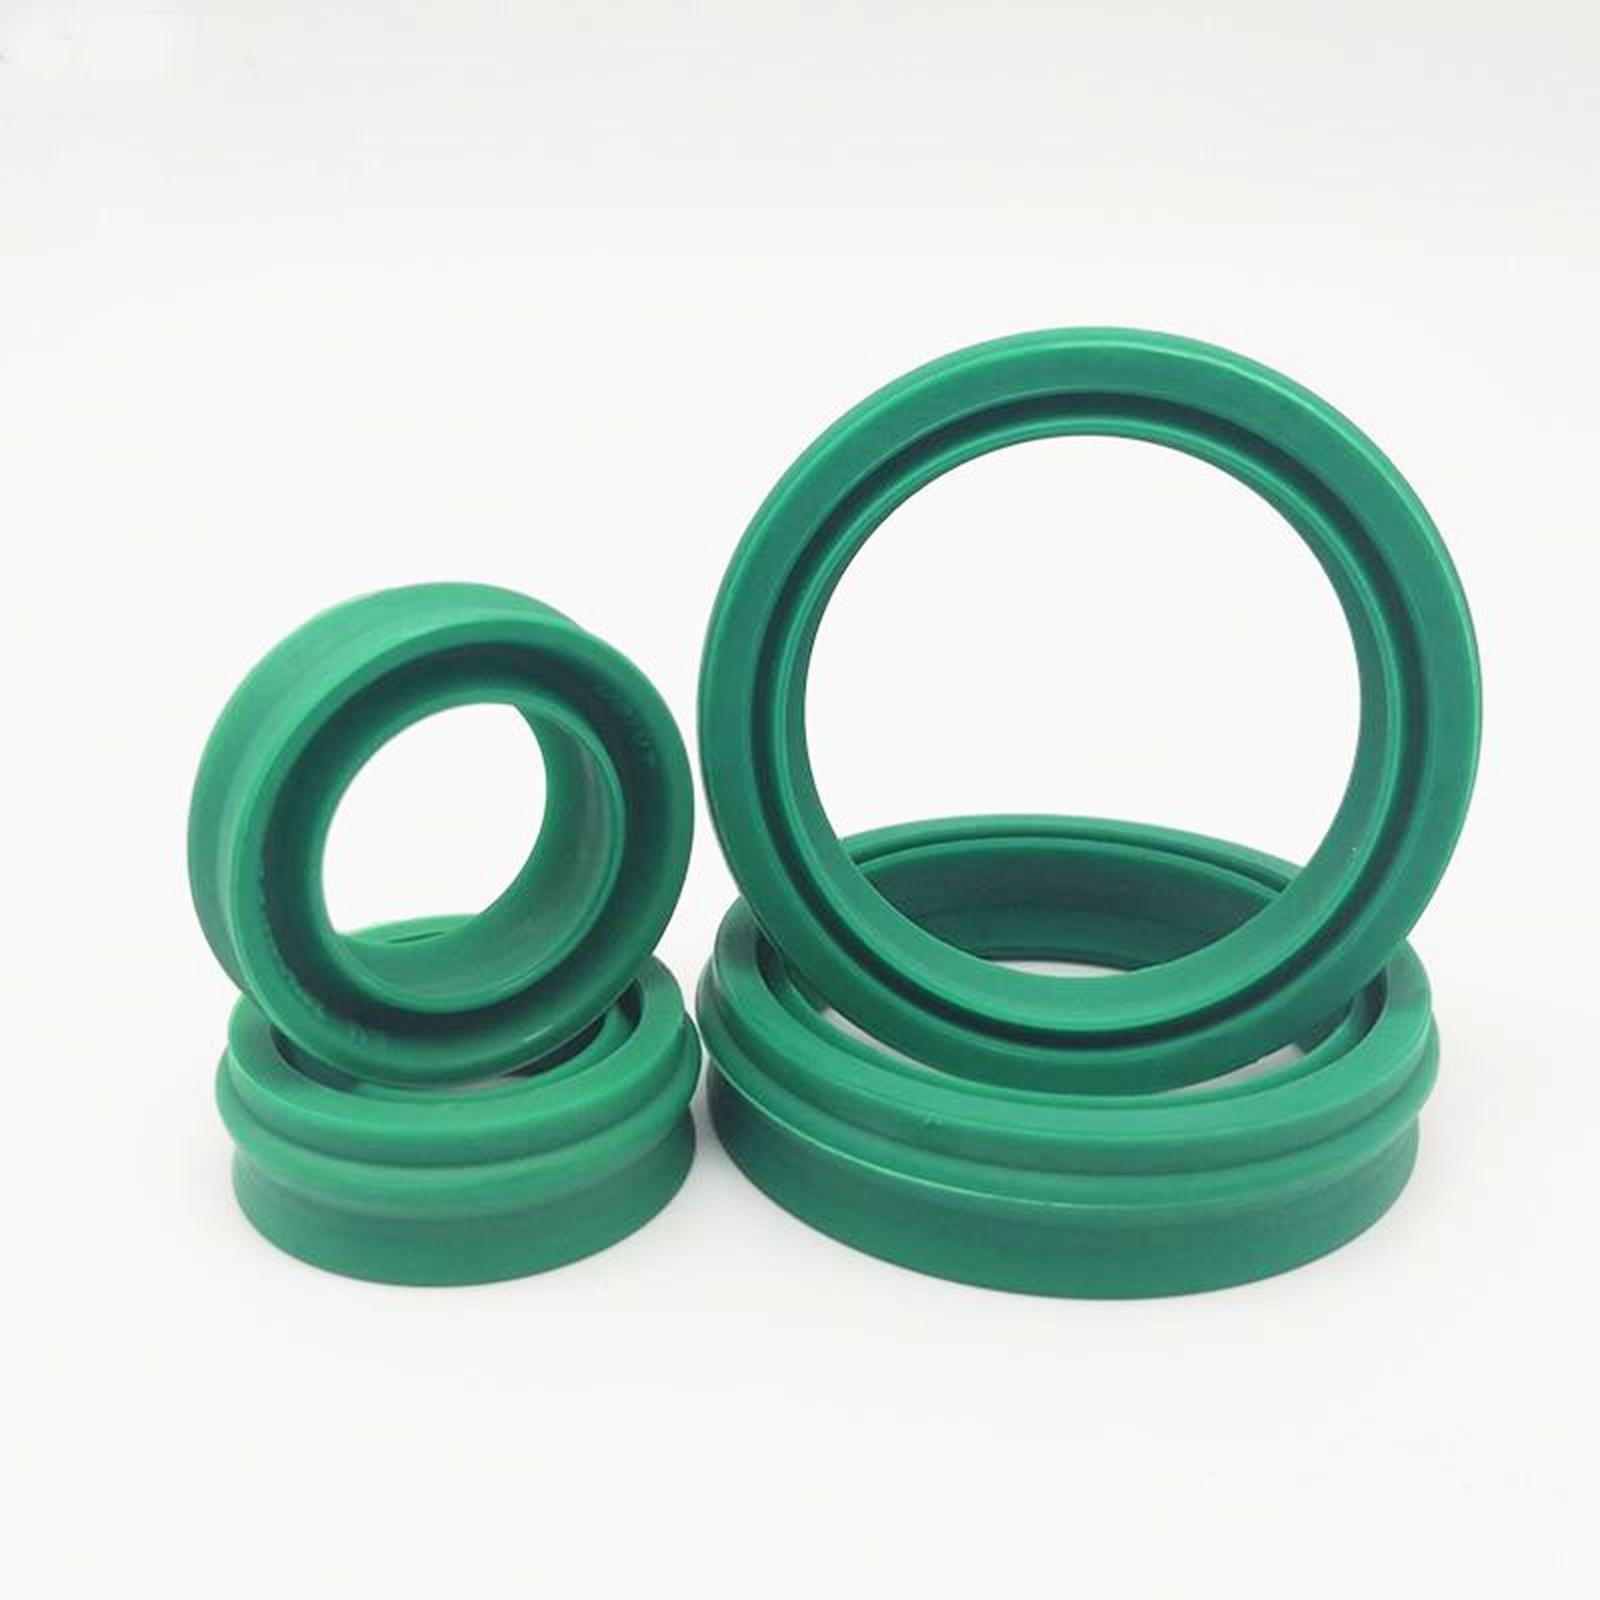 I/D 12/14/16/18/20/22/25/30/40/45/50/63mm tipo europeo sello de aceite verde pistón del cilindro neumático eje giratorio PU poliuretano